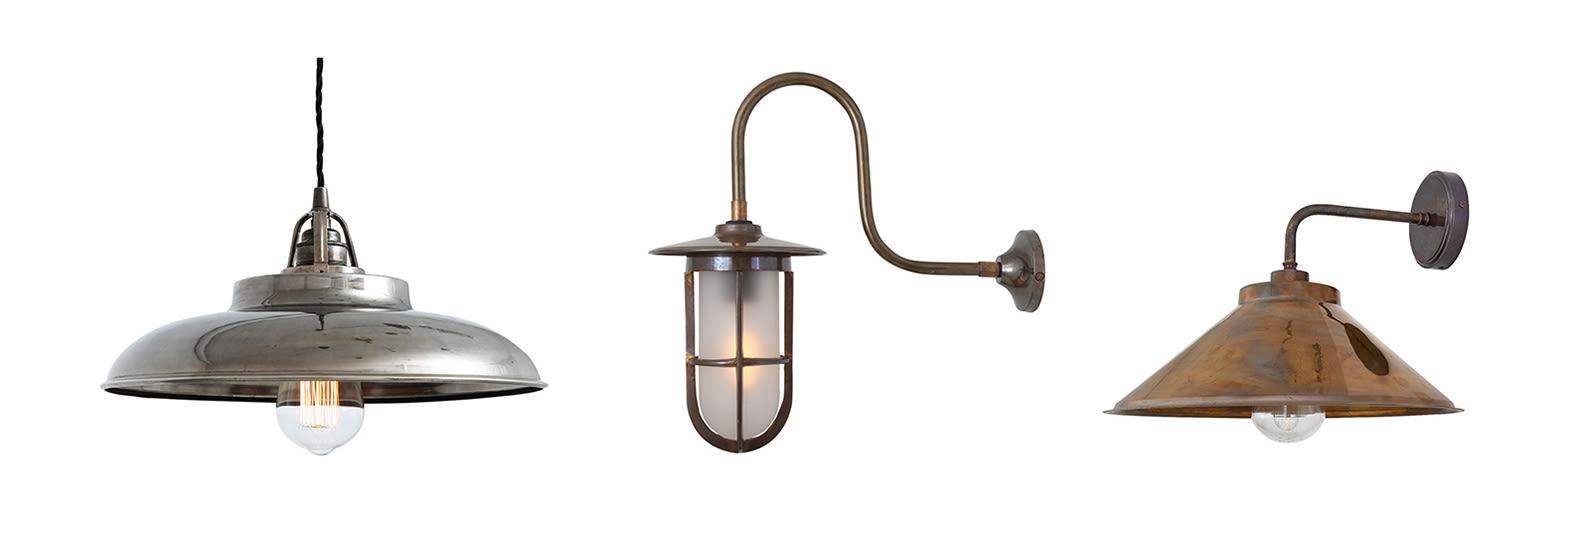 telal-pendant-fabo-wall-light-nerissa-wall-sconce-mullan-lighting-lighting-trends-2020